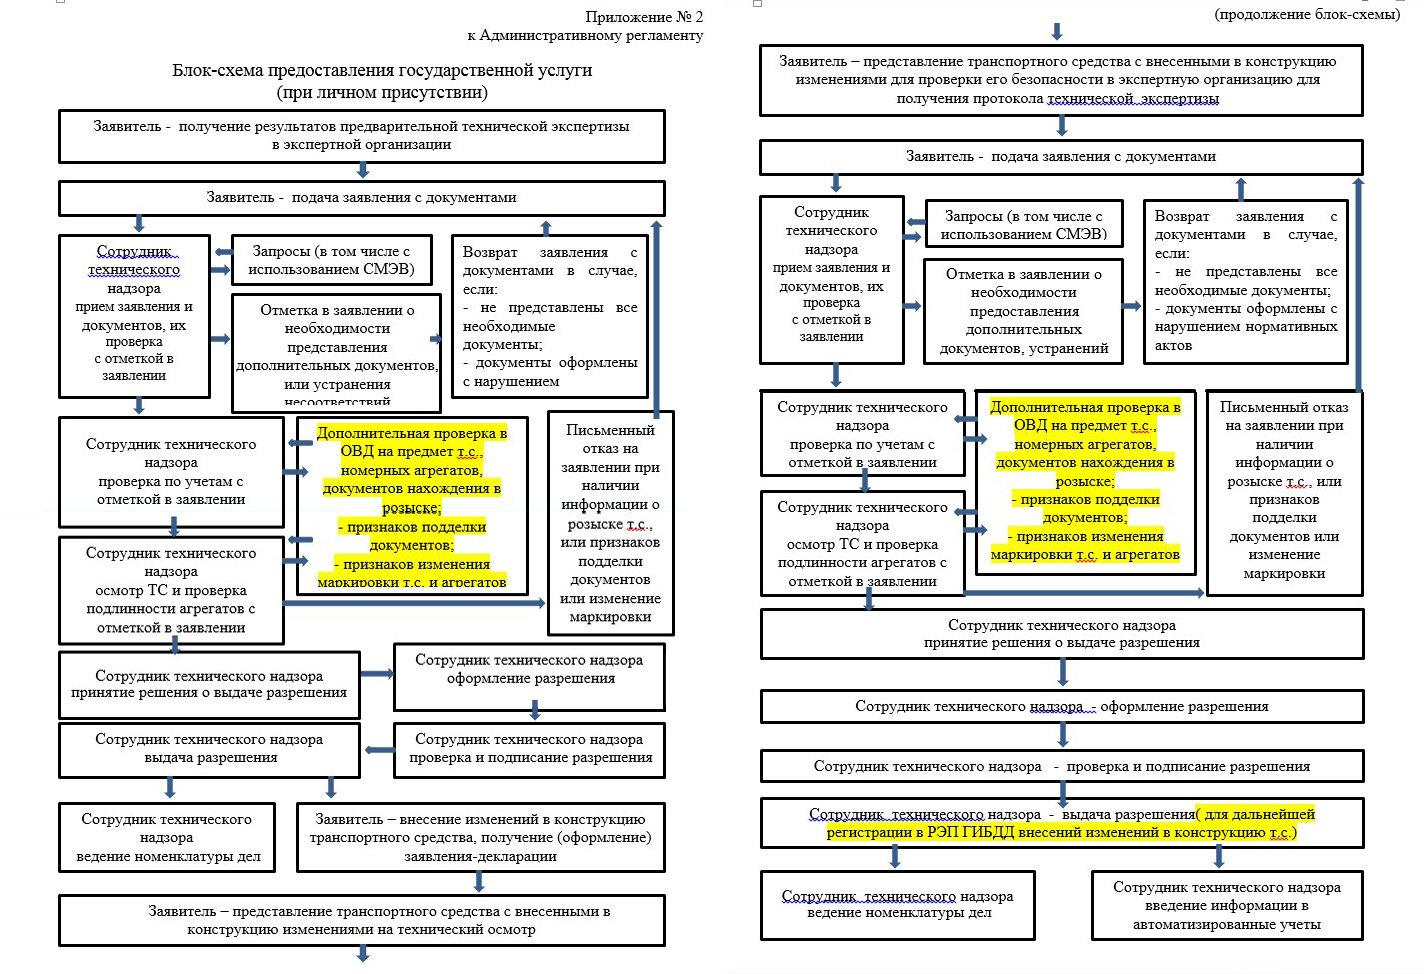 схема разработки и принятия технического регламента